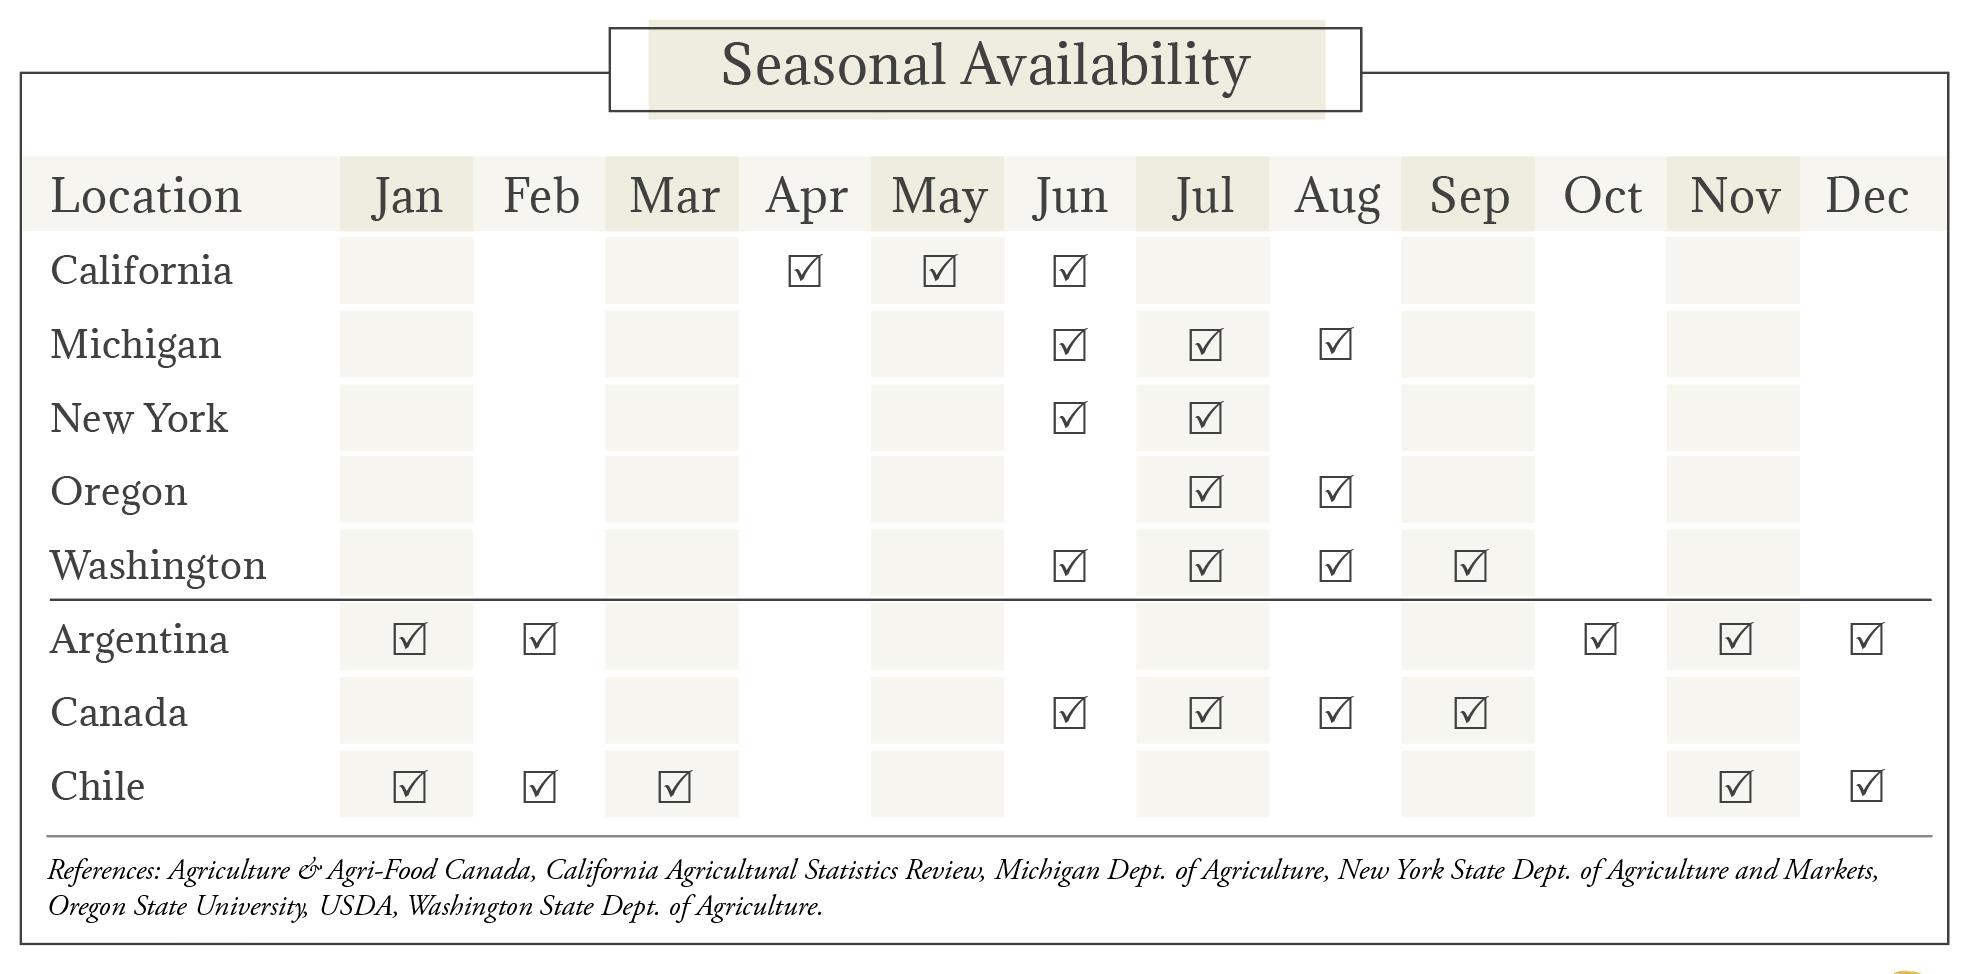 Cassava Seasonal Availability Chart